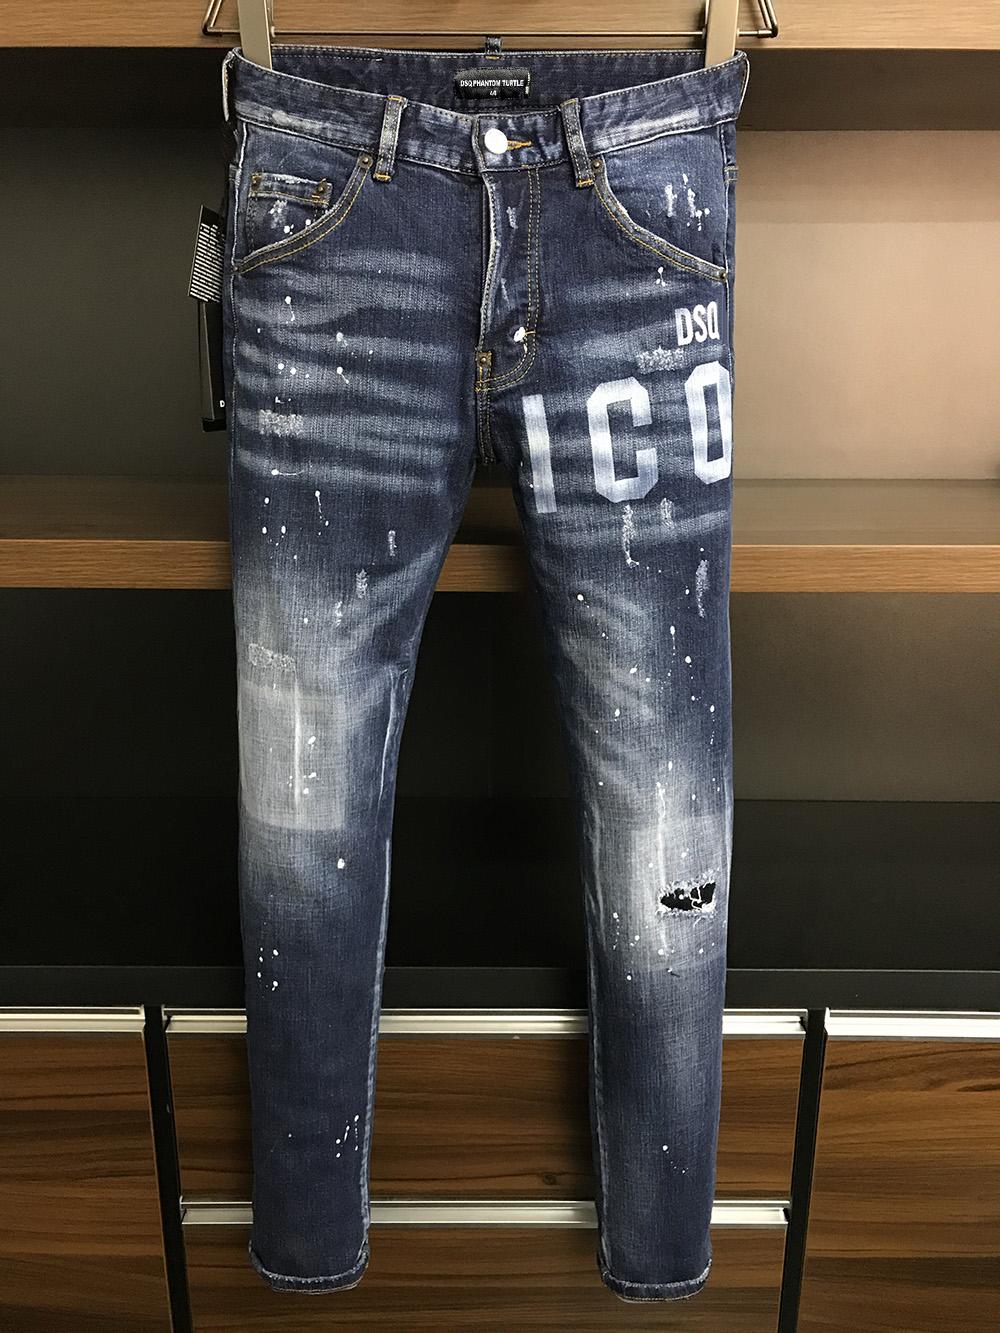 DSQ PHANTOM TURTLE Classic Fashion Man Jeans Hip Hop Rock Moto Mens Casual Design Ripped Jeans Distressed Skinny Denim Biker DSQ Jeans 81248